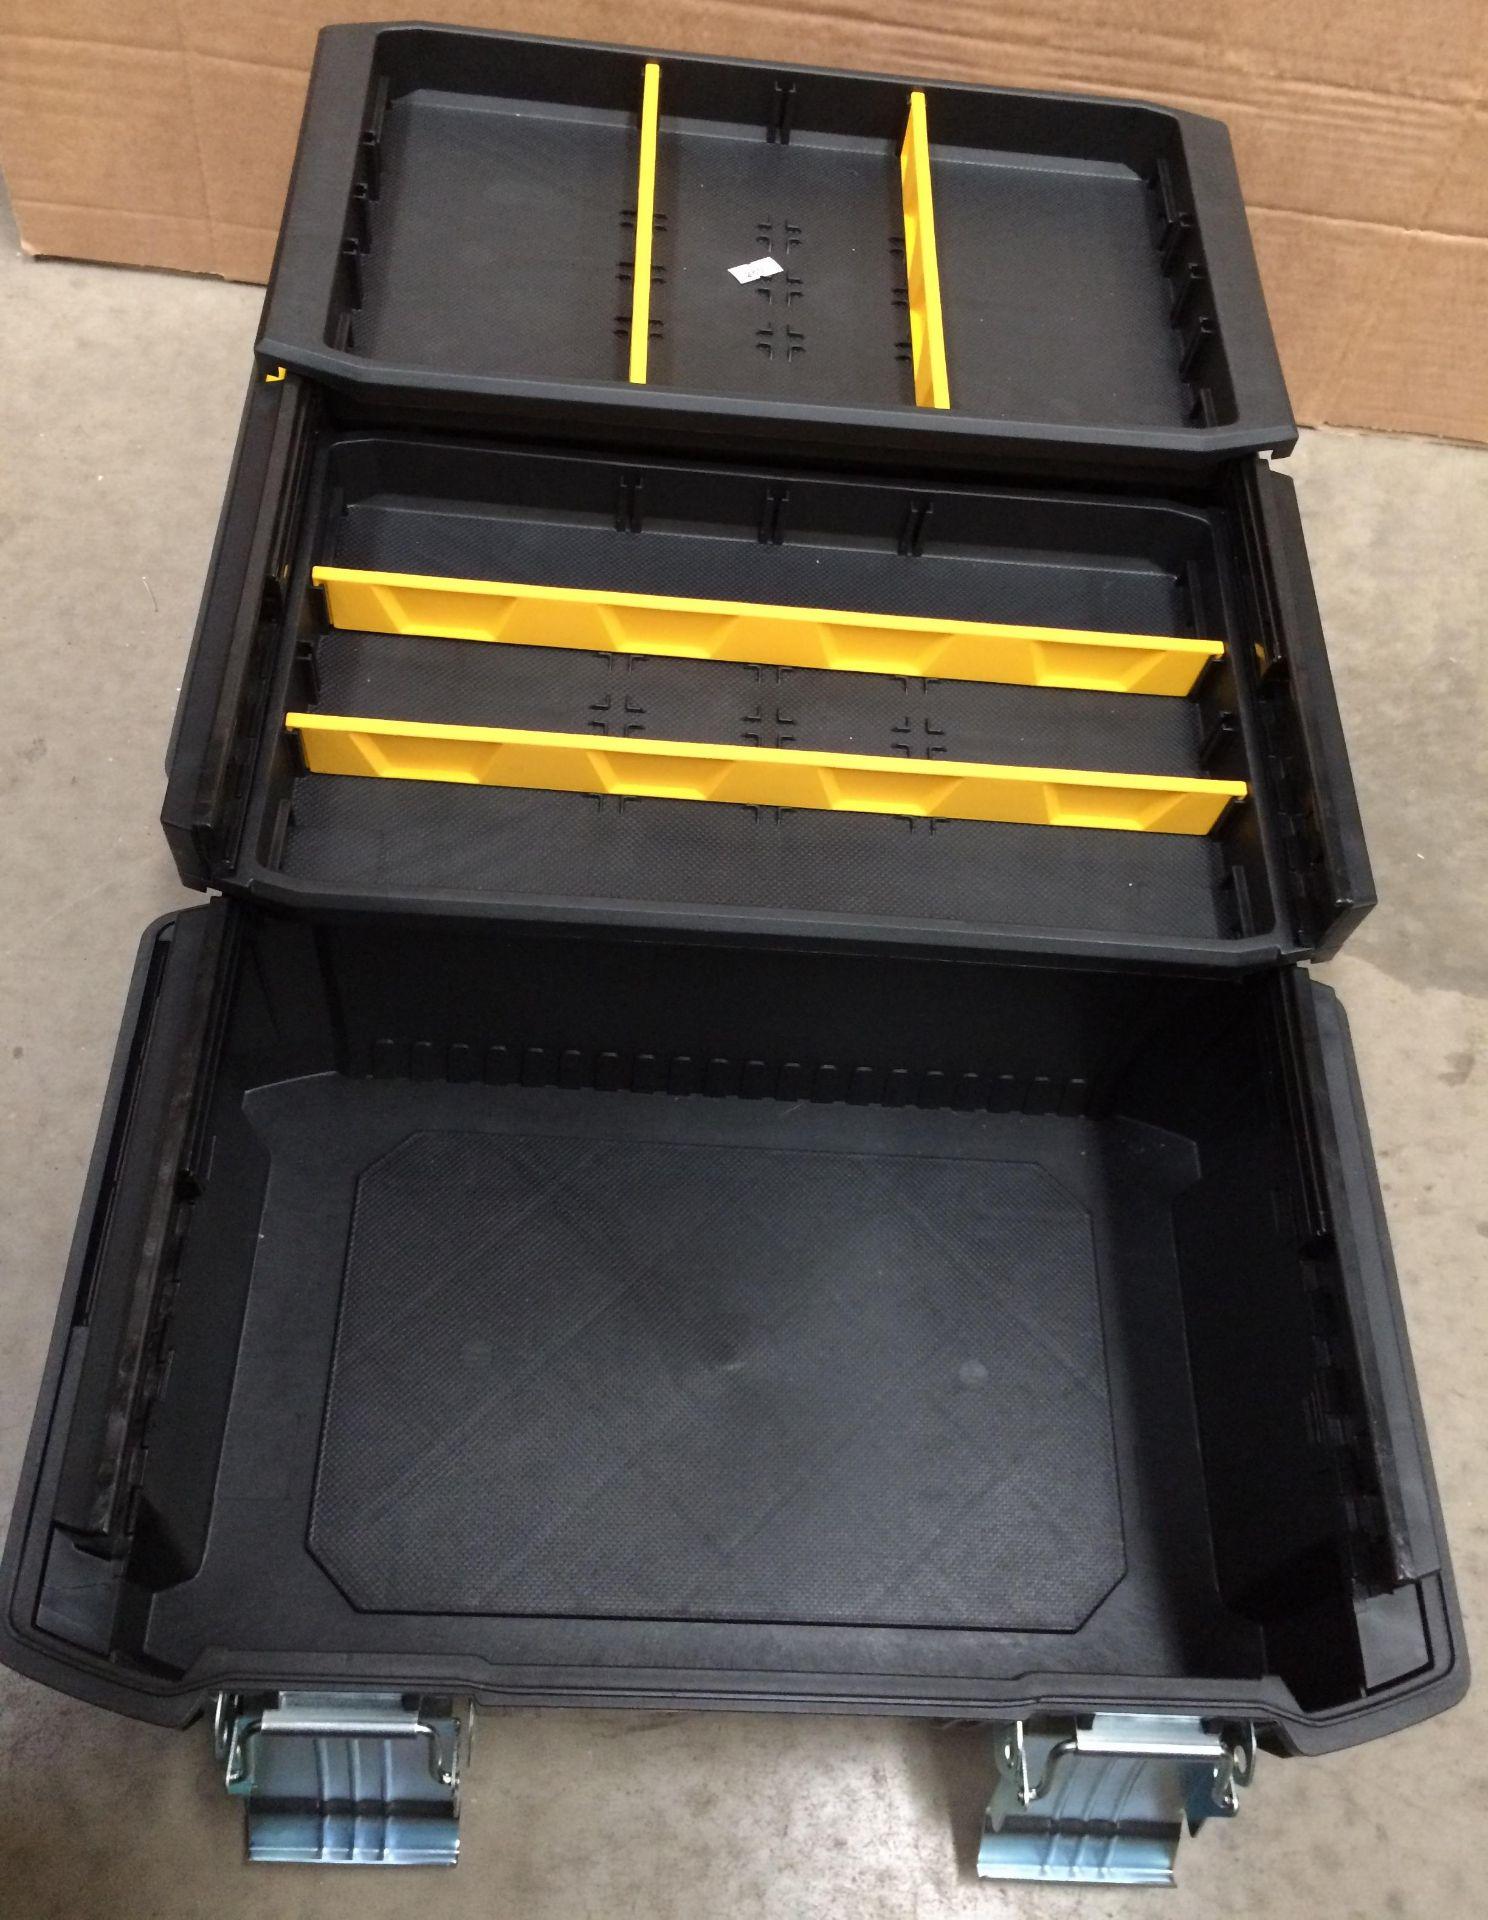 Stanley Fatmax 26cm three level tool box - Image 2 of 3